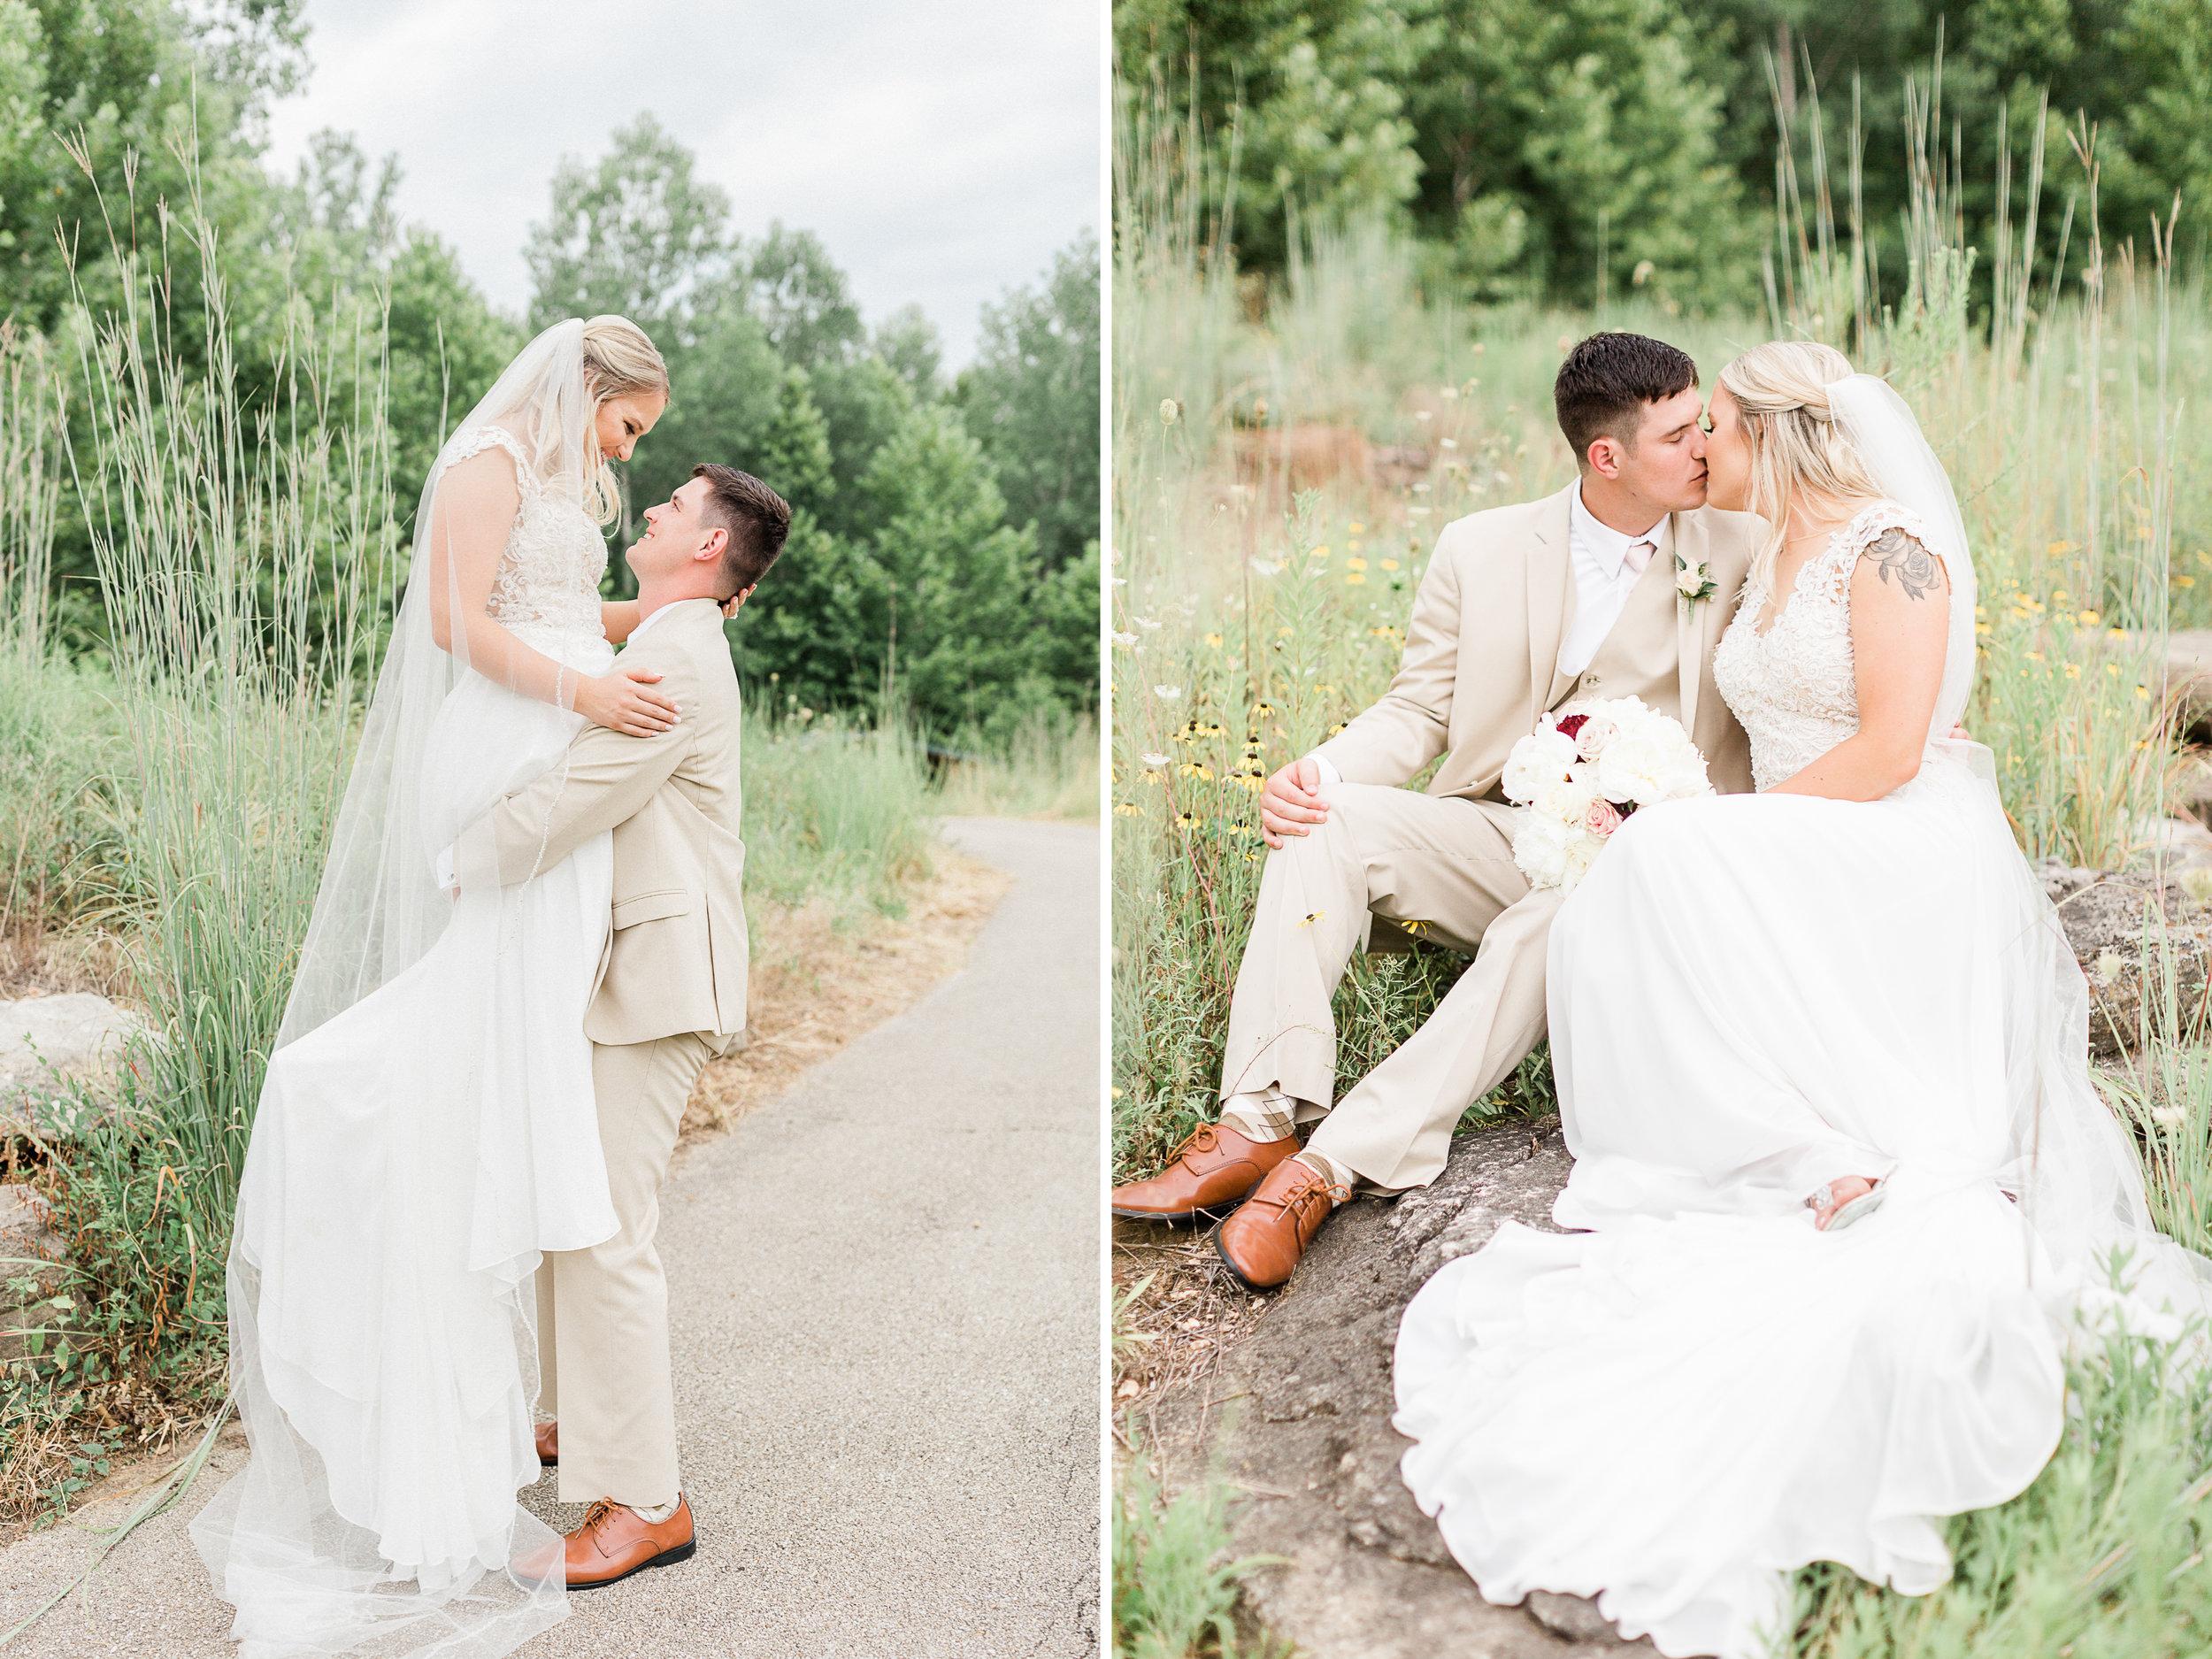 Dorothy_Louise_Photography_Marissa_Jake_Wentzville_MO_Wedding20.jpg